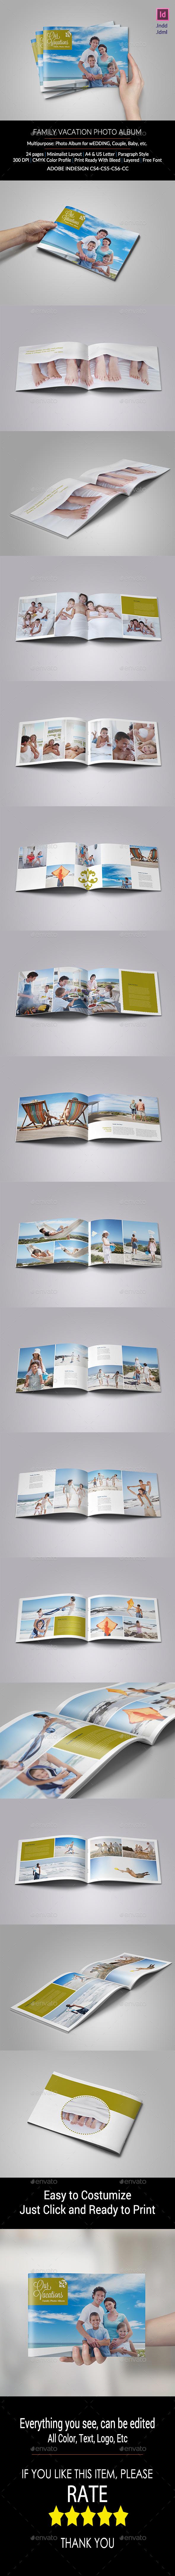 family vacation photo album photo albums print templates